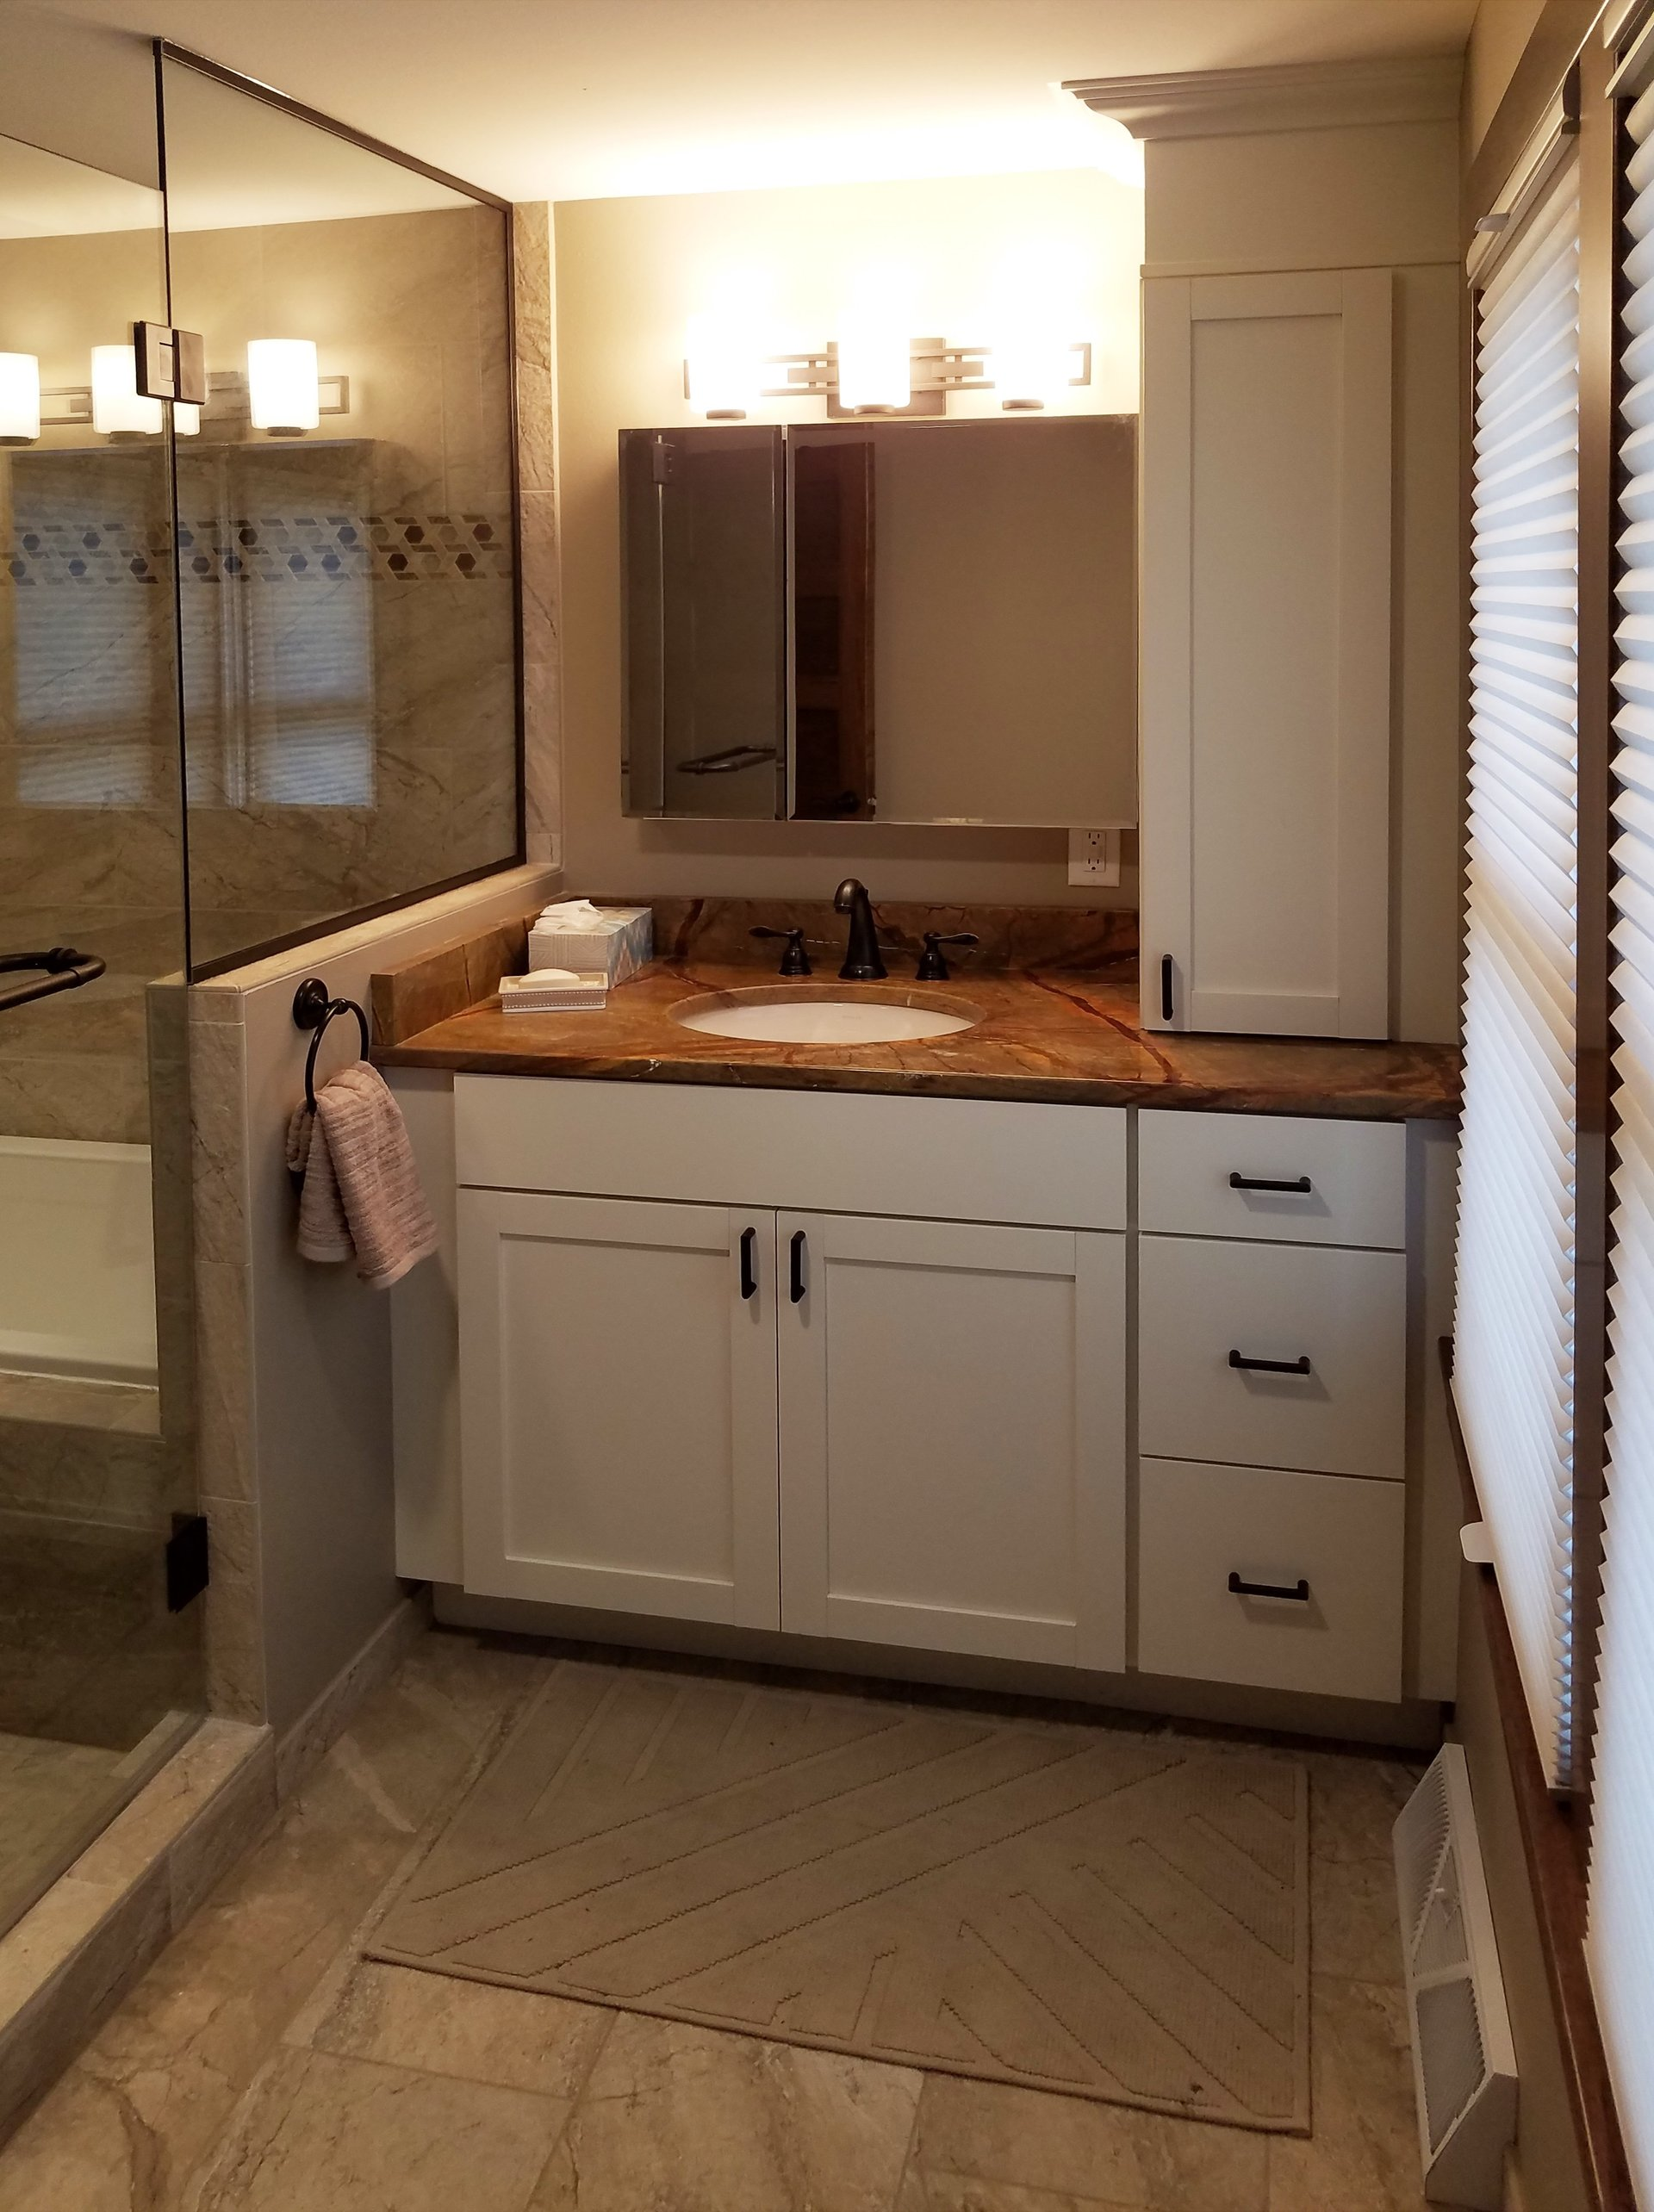 Bathroom vanities madison wi - White Shaker Style Vanity Transitional Bathroom Design In Madison Wi Side Vanity Storage